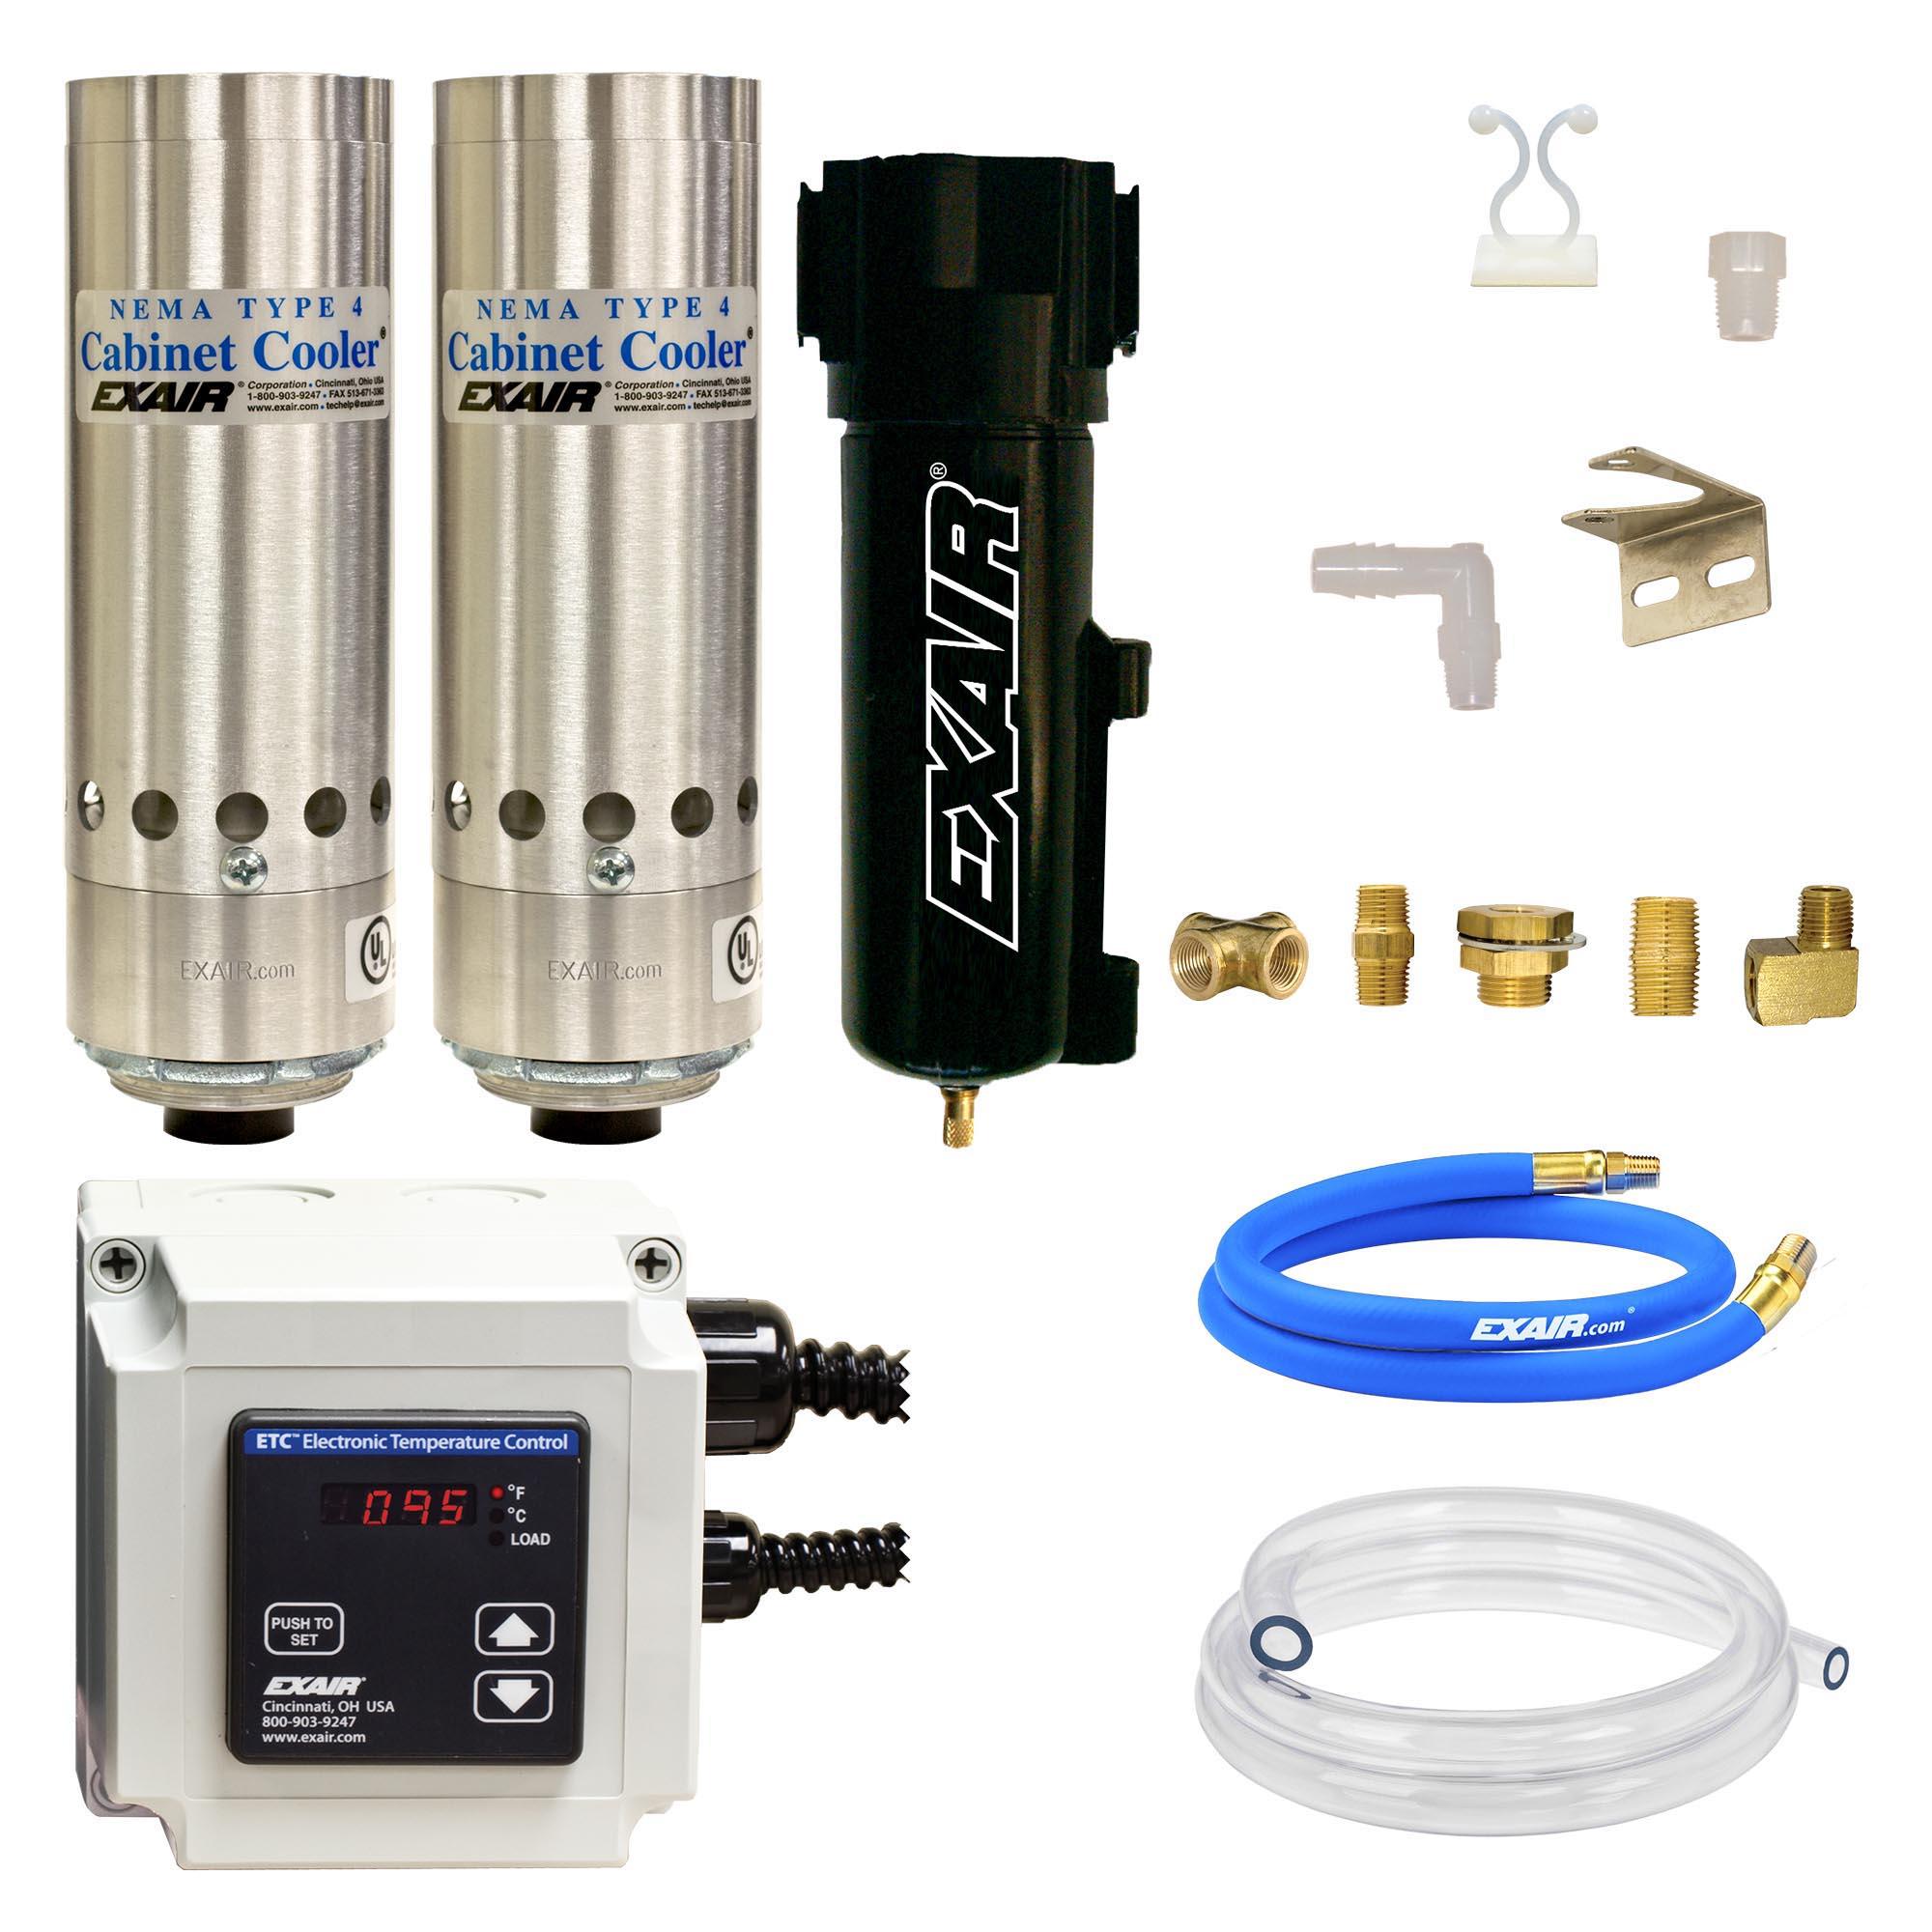 Model W4880-ETC120 NEMA 4 5,600 Btu/hr Cabinet Cooler System with ETC Thermostat Control, 120V